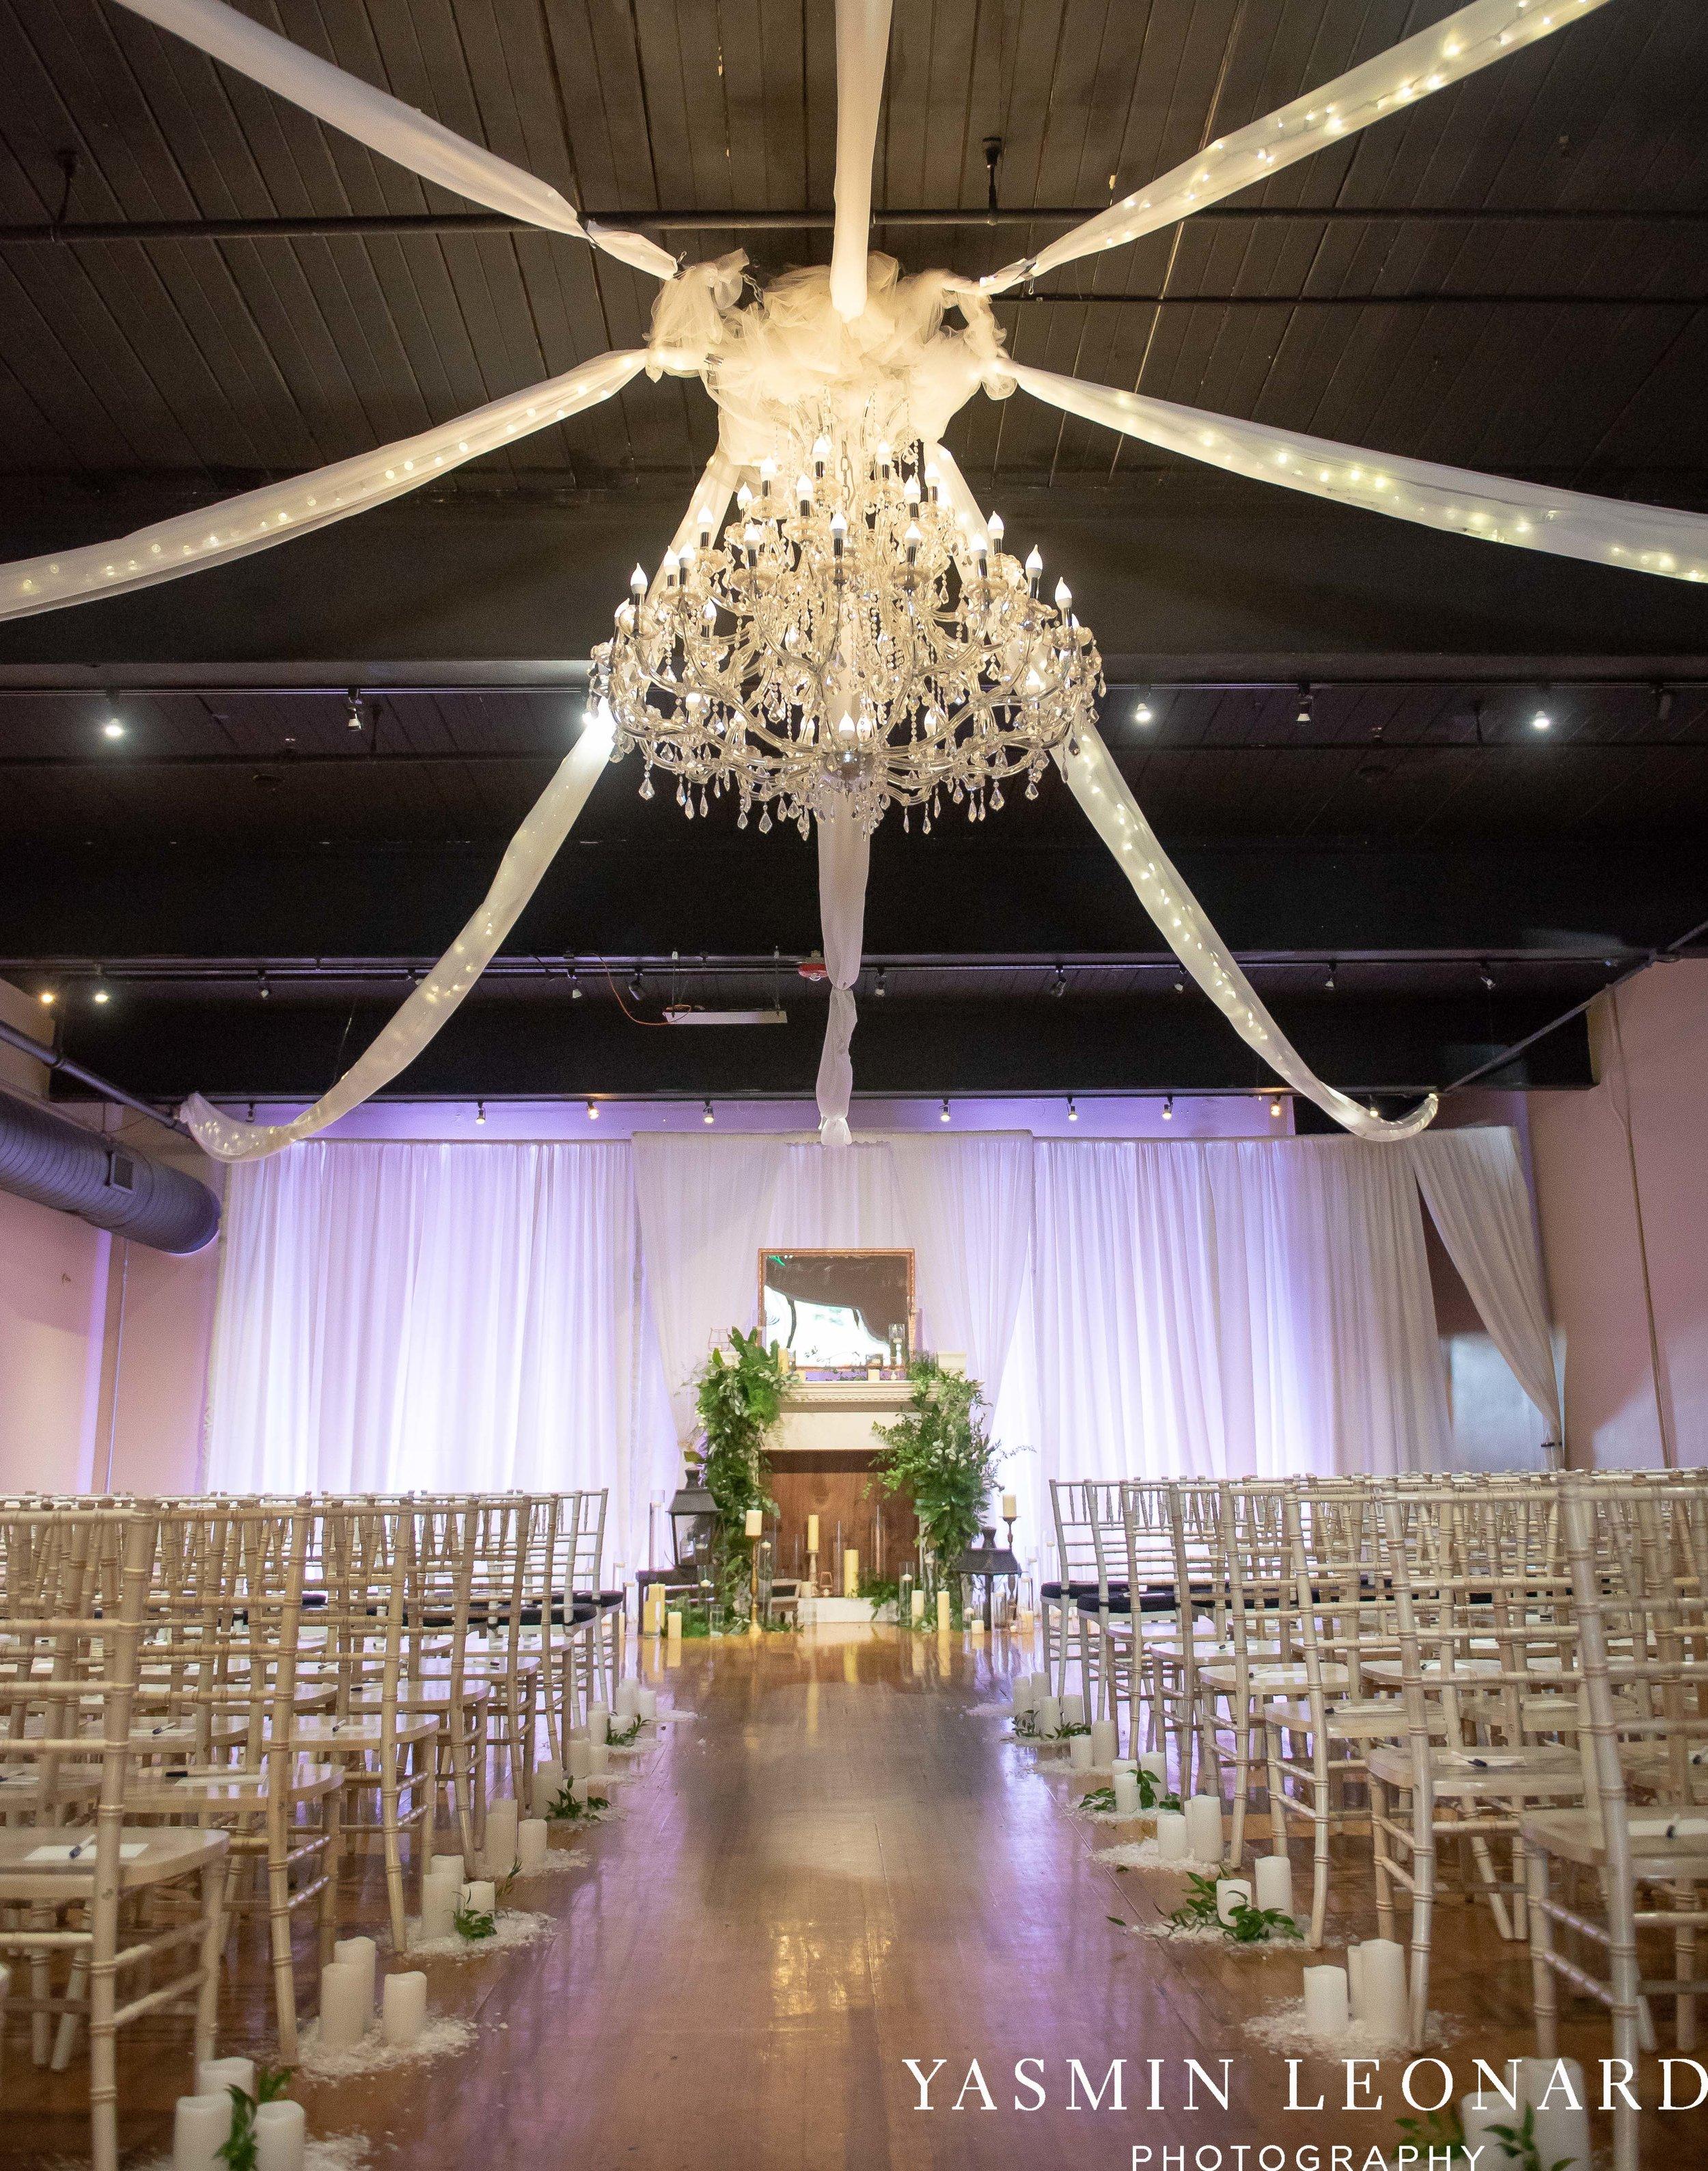 Rebekah and Matt - 105 Worth Event Centre - Yasmin Leonard Photography - Asheboro Wedding - NC Wedding - High Point Weddings - Triad Weddings - Winter Wedding-1.jpg